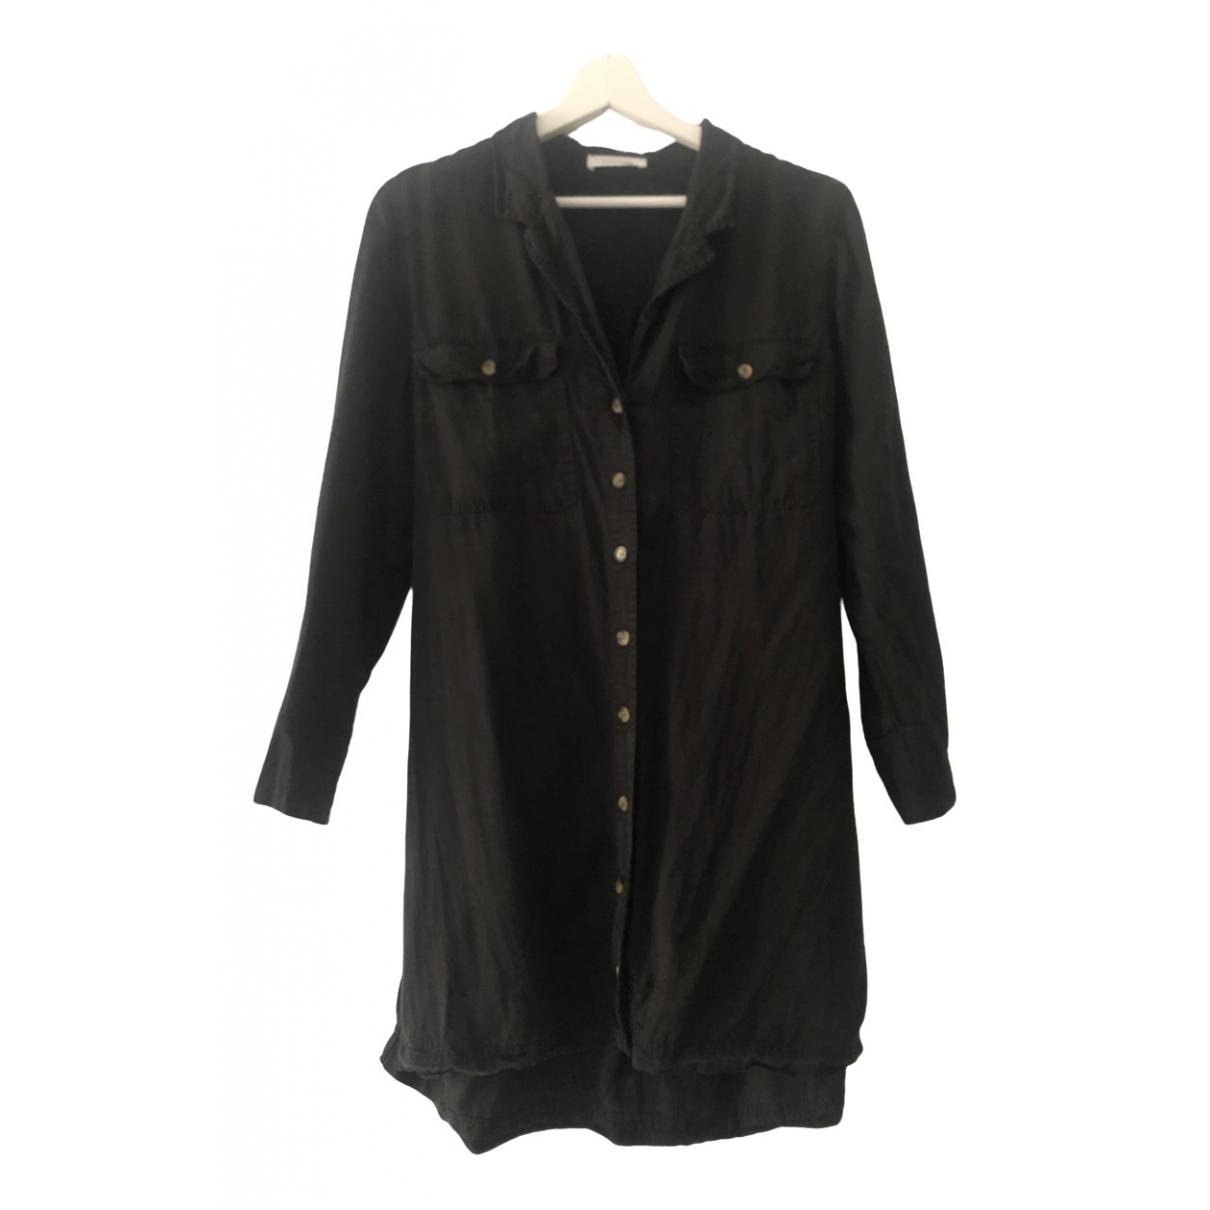 Anine Bing \N Kleid in  Schwarz Baumwolle